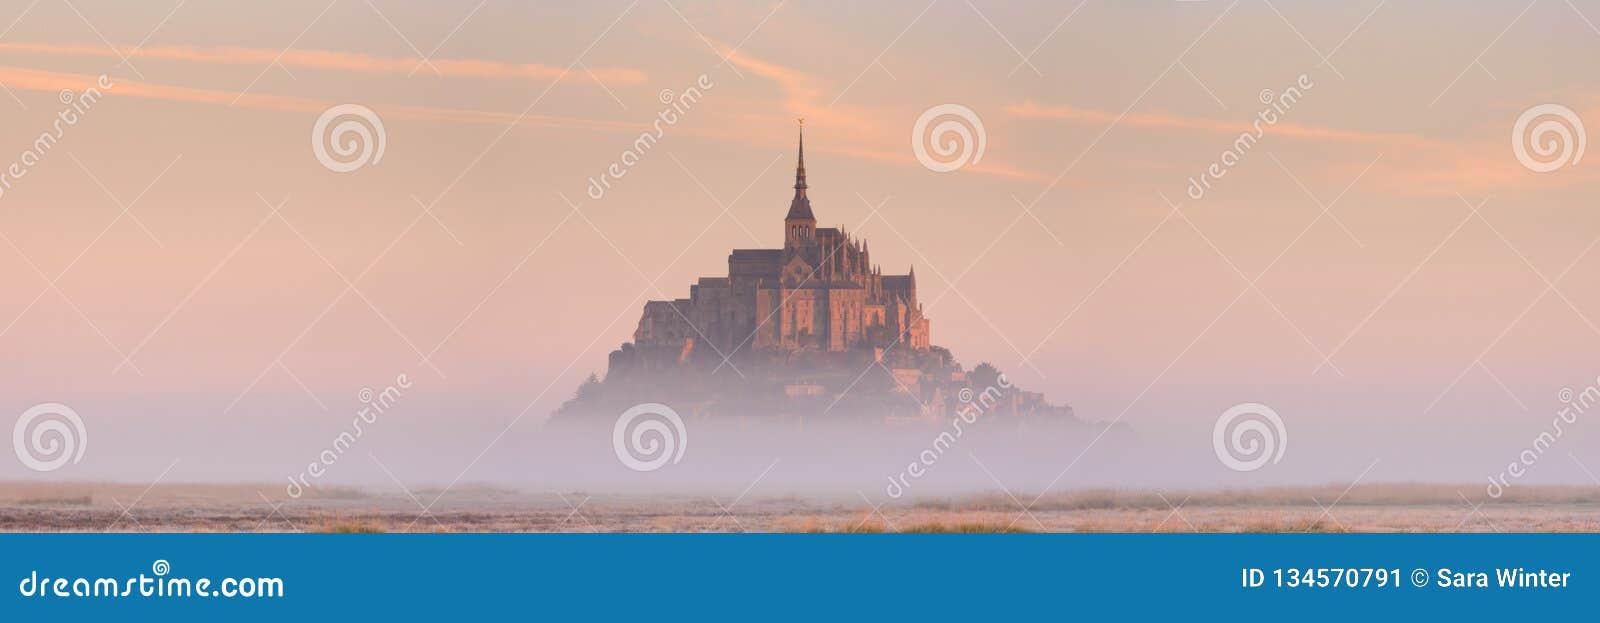 Le Mont saint michel w Normandy, Francja przy wschód słońca